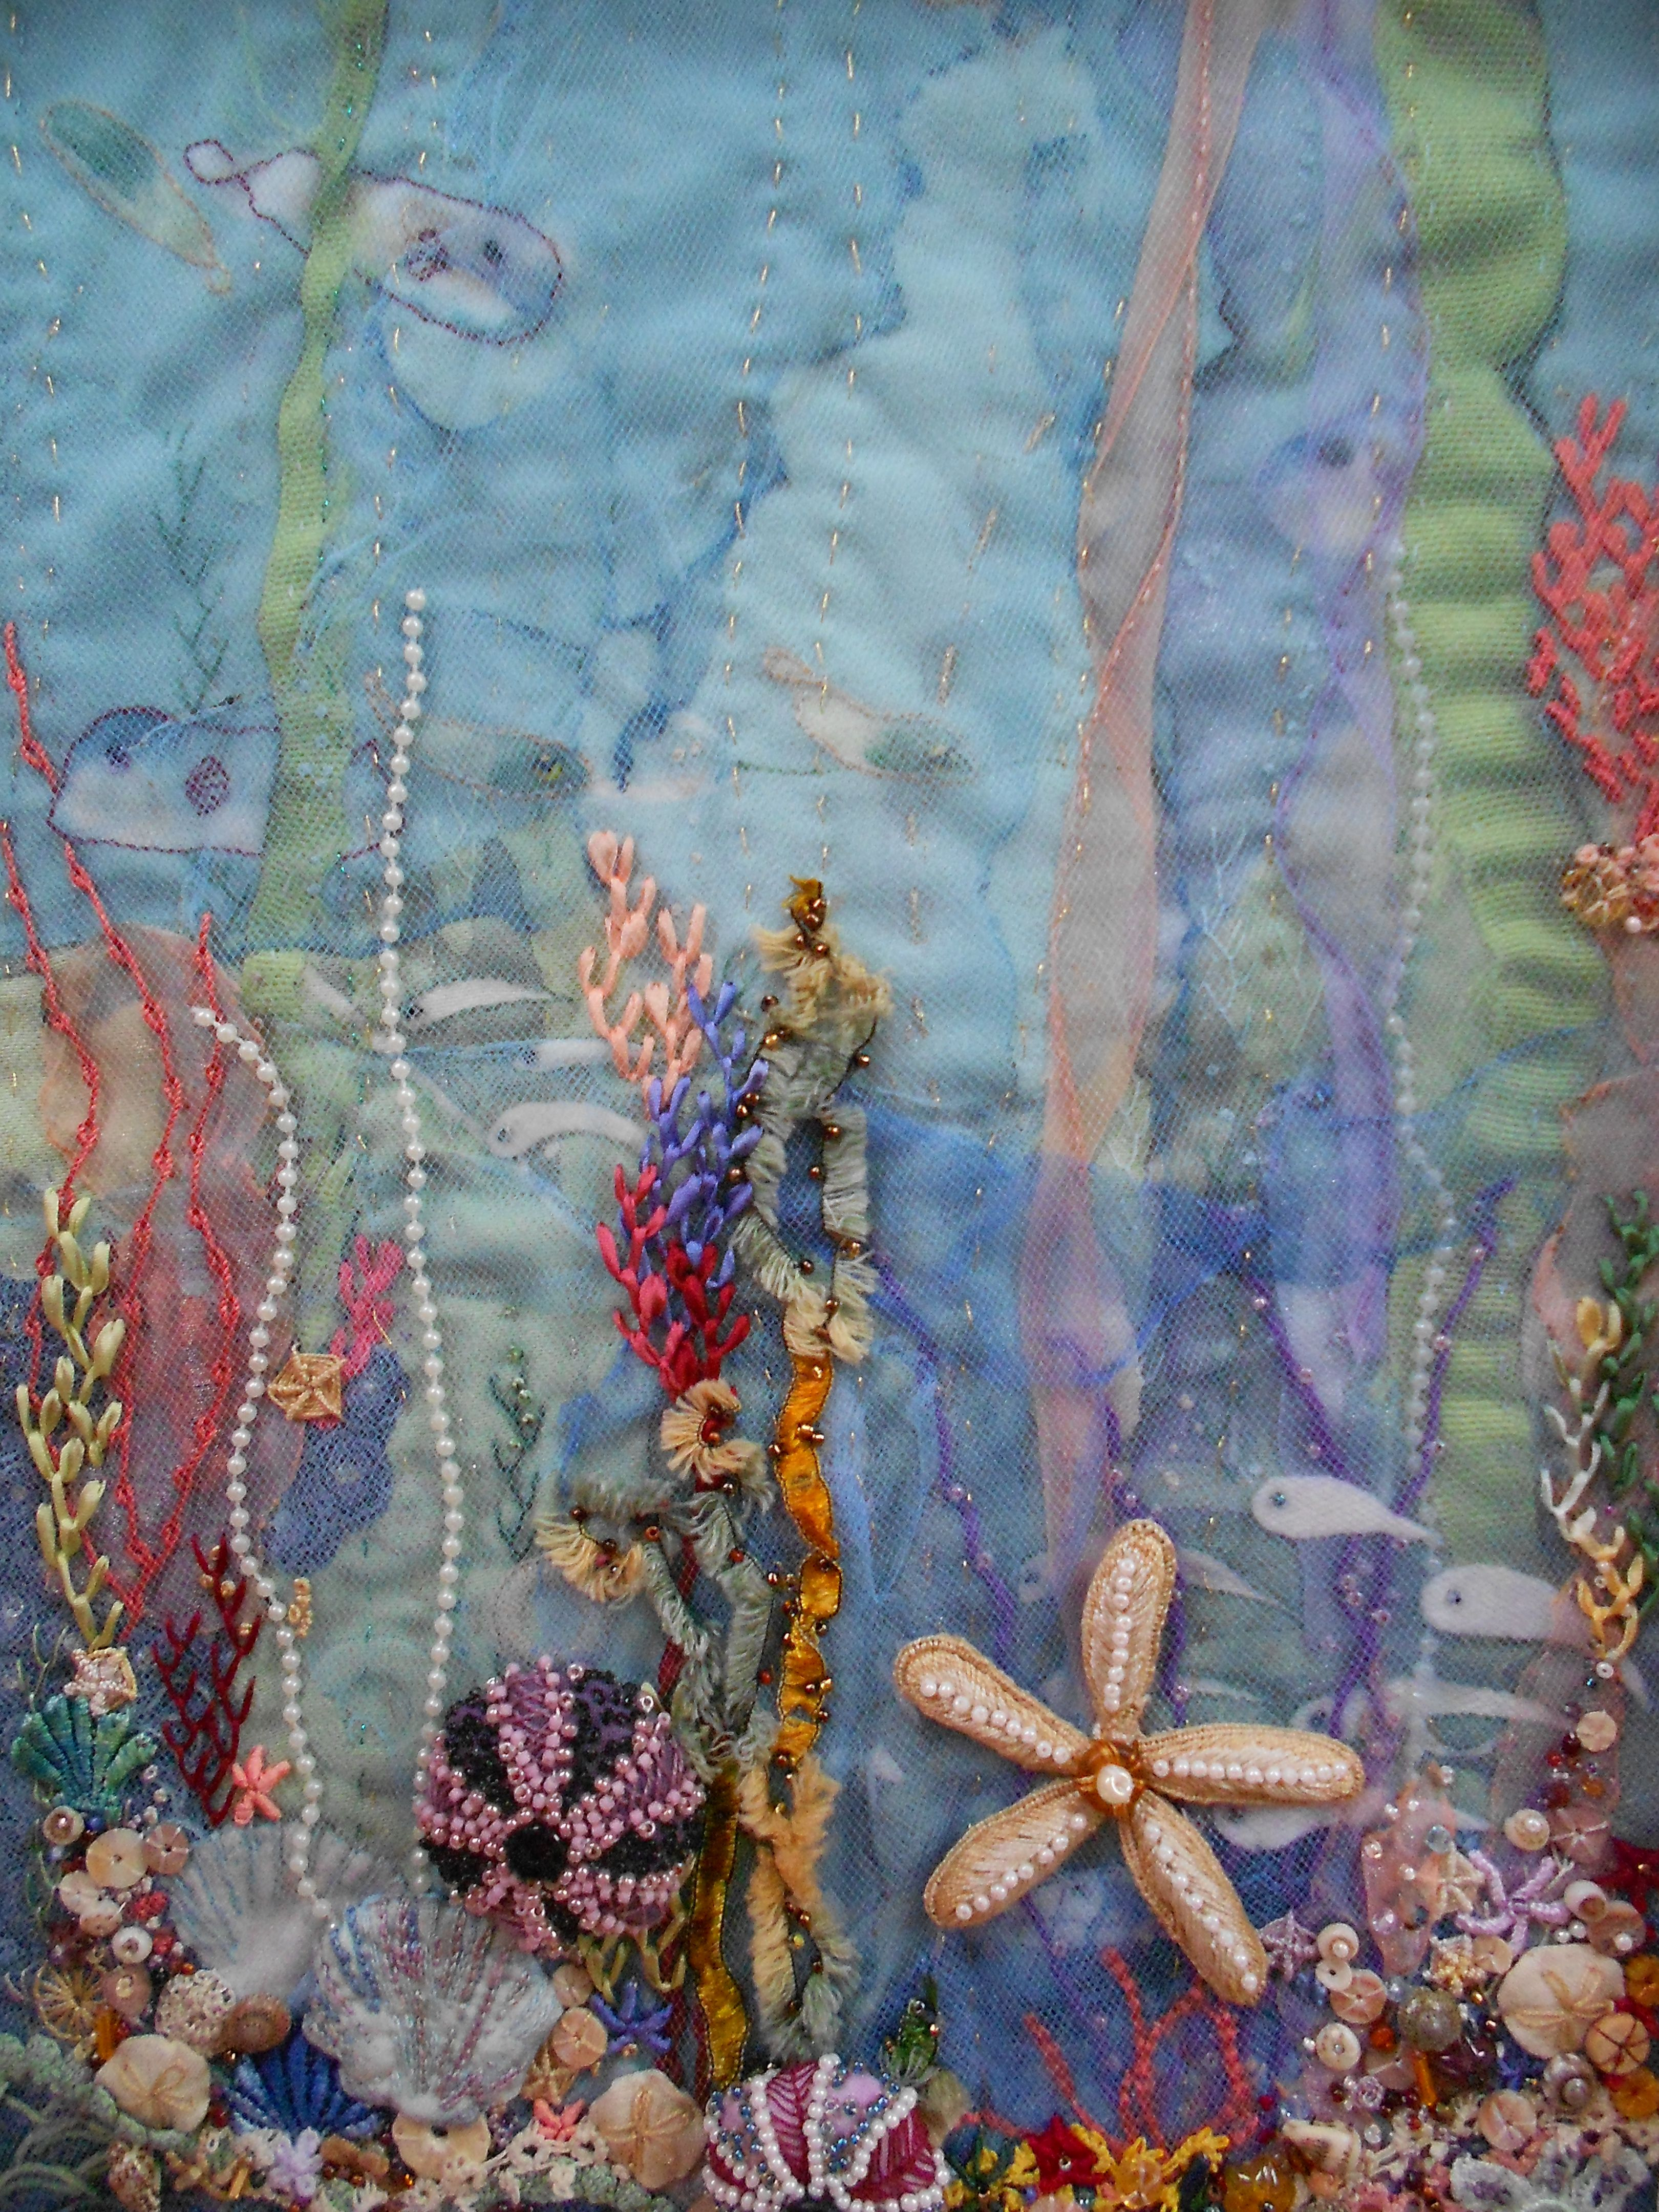 Undersea fantasy artist nancy larsen multi media embroidery undersea fantasy artist nancy larsen multi media embroidery voltagebd Choice Image